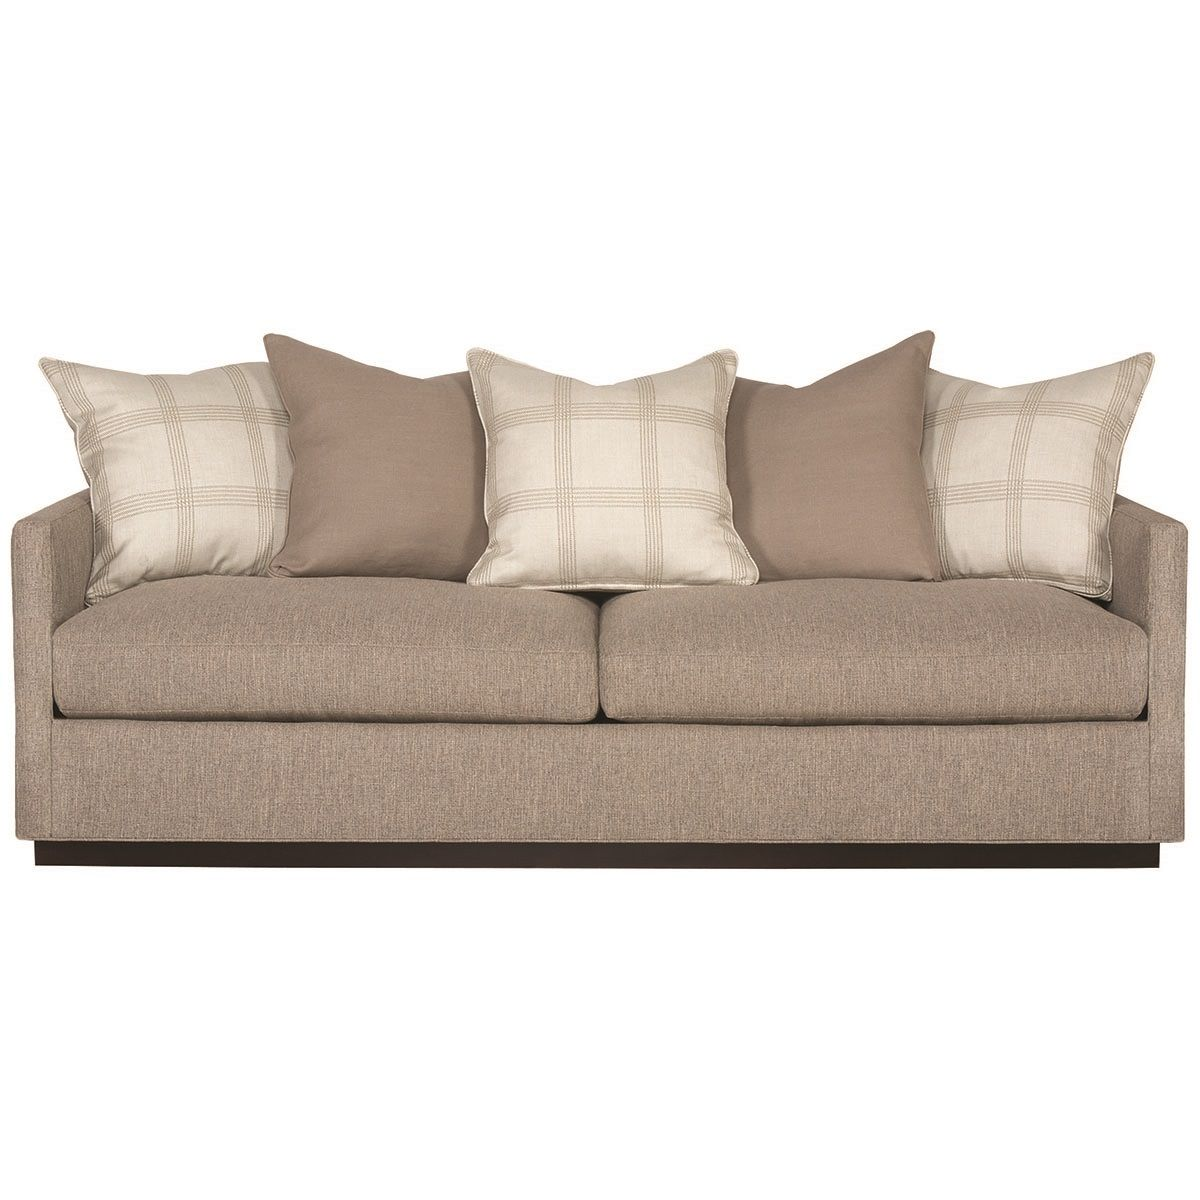 Vanguard Furniture Vista Sofa W153 2s Vanguad Furniture